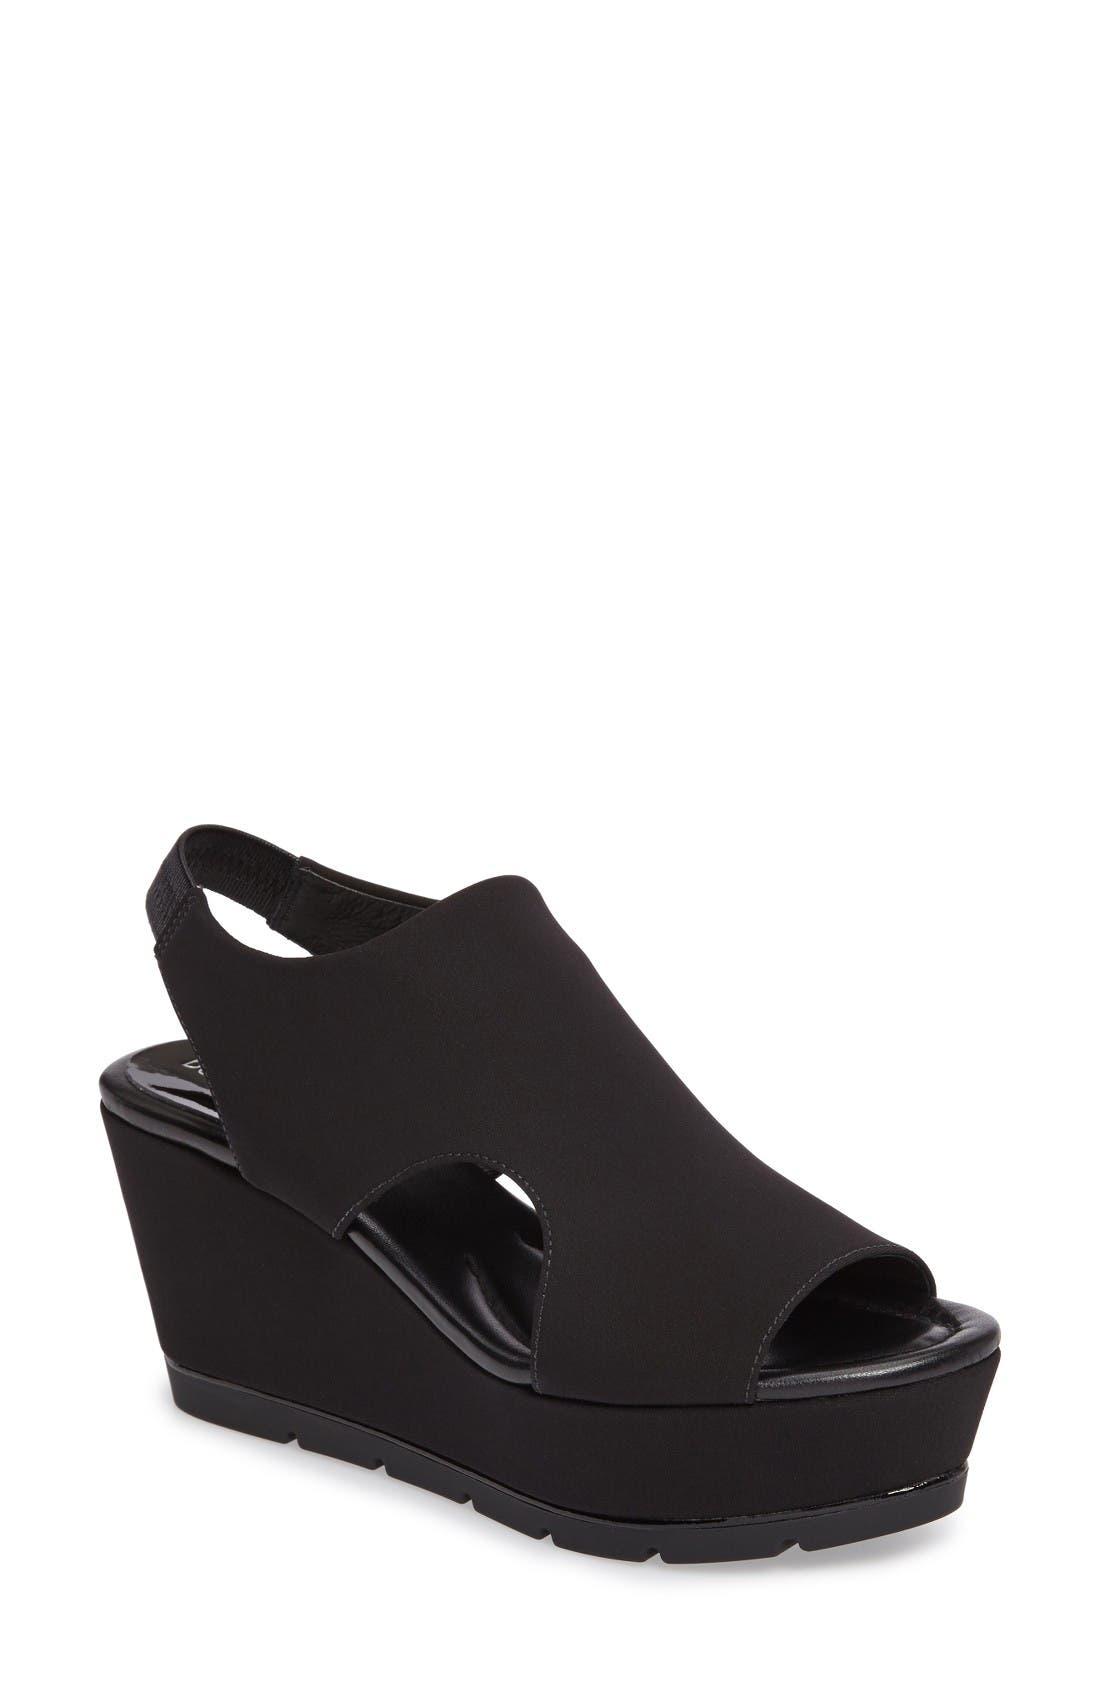 Donald J Pliner Fonda Platform Wedge Sandal,                         Main,                         color, Black Crepe